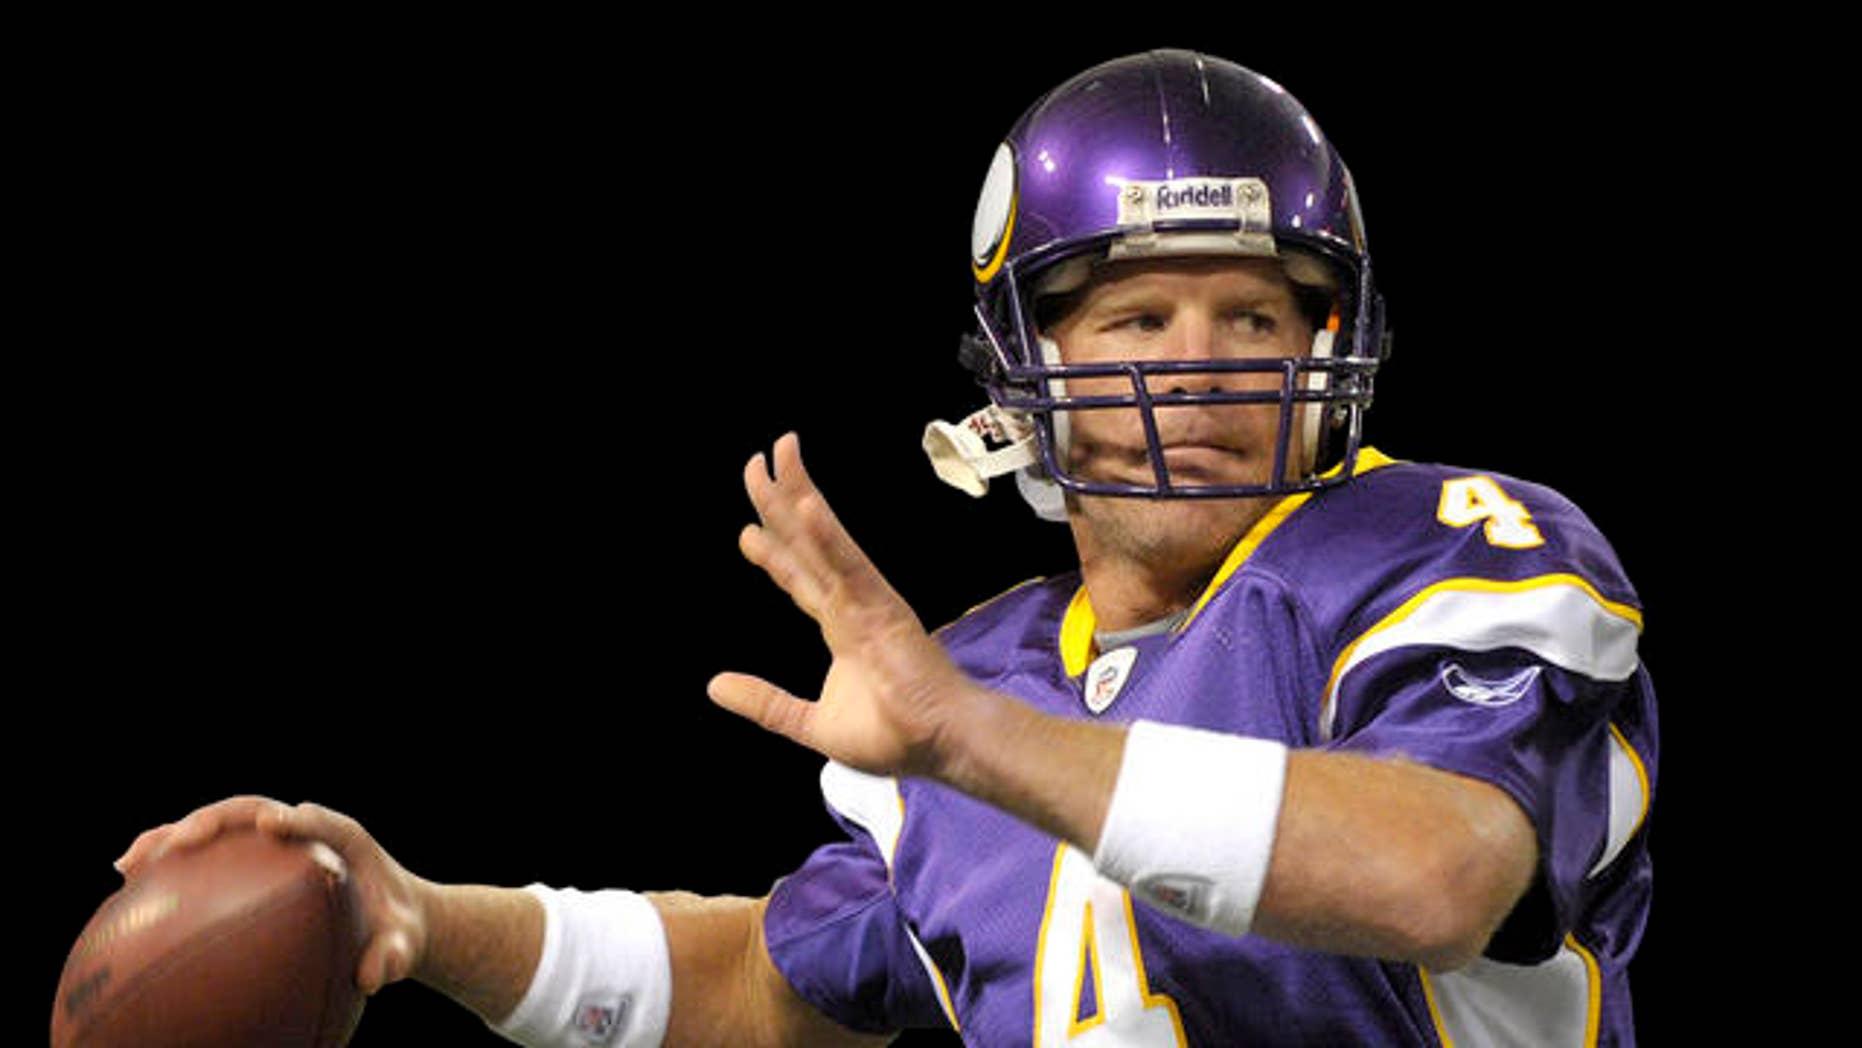 Minnesota Vikings' quarterback Brett Favre harms-up prior to the Vikings NFL pre-season football game against the Kansas City Chiefs  Friday, Aug. 21, 2009 in Minneapolis.(AP Photo/Tom Olmscheid)